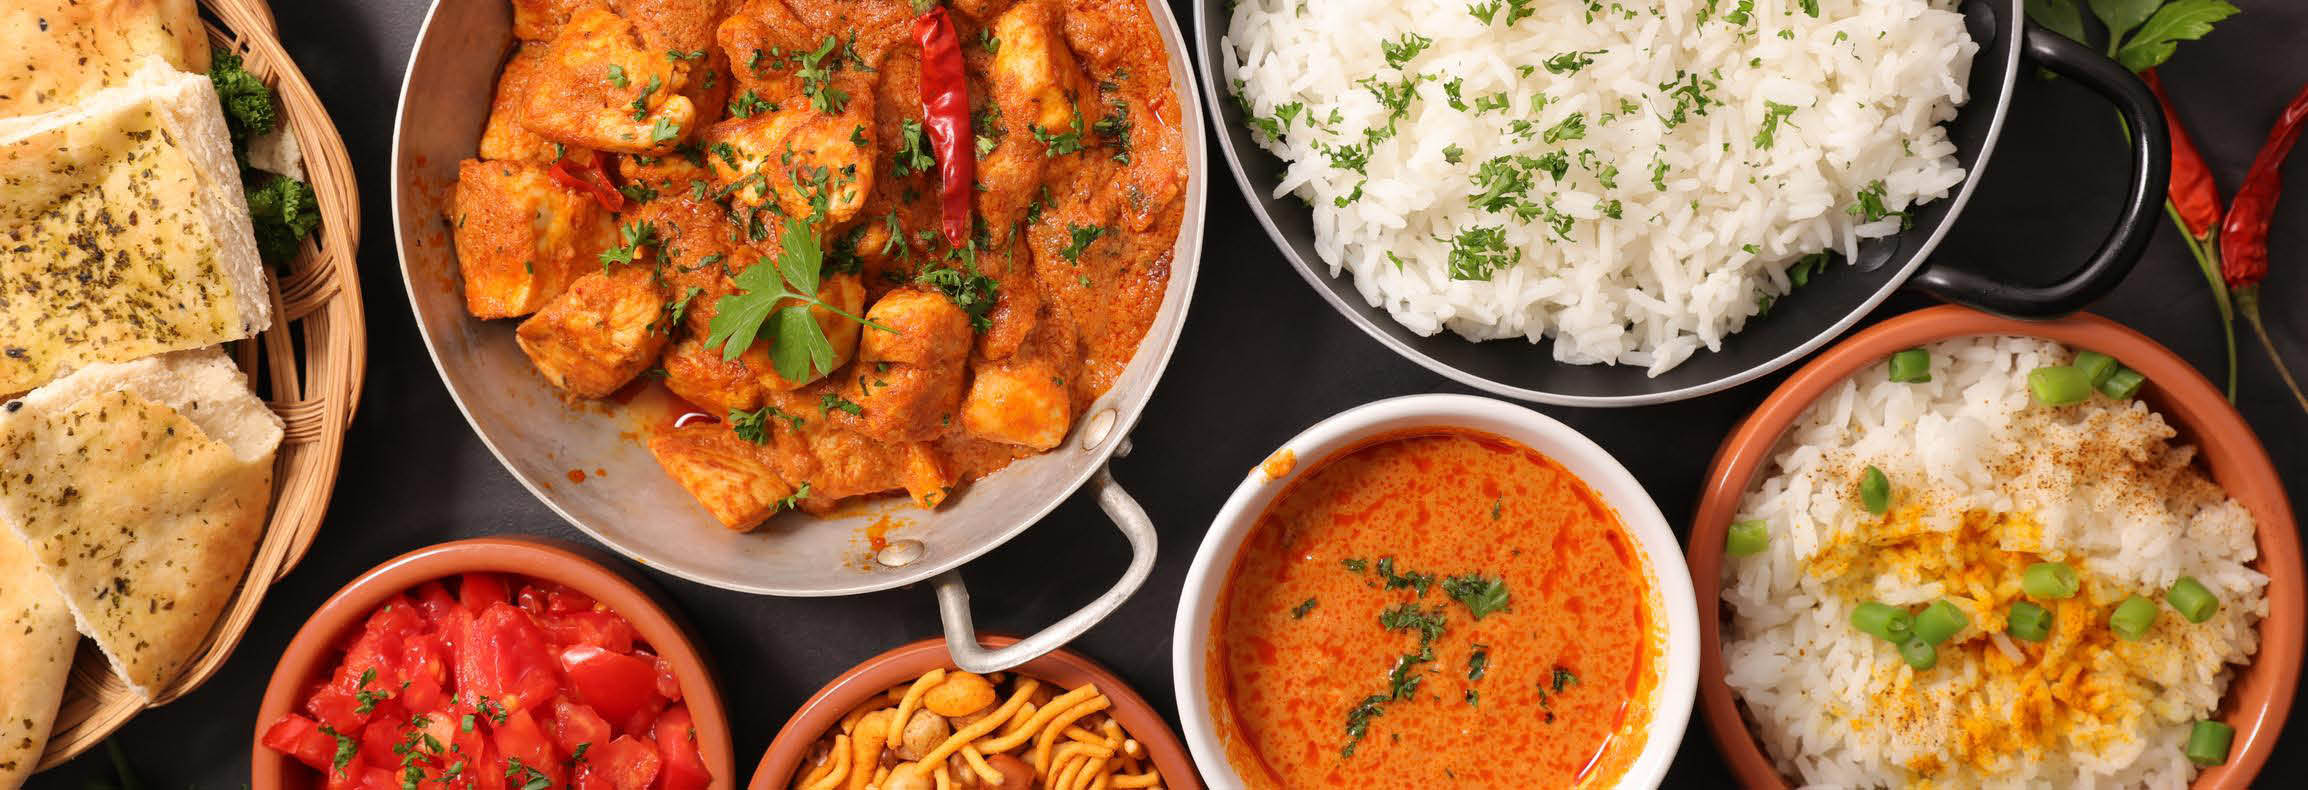 nanak india indian food west chester ohio